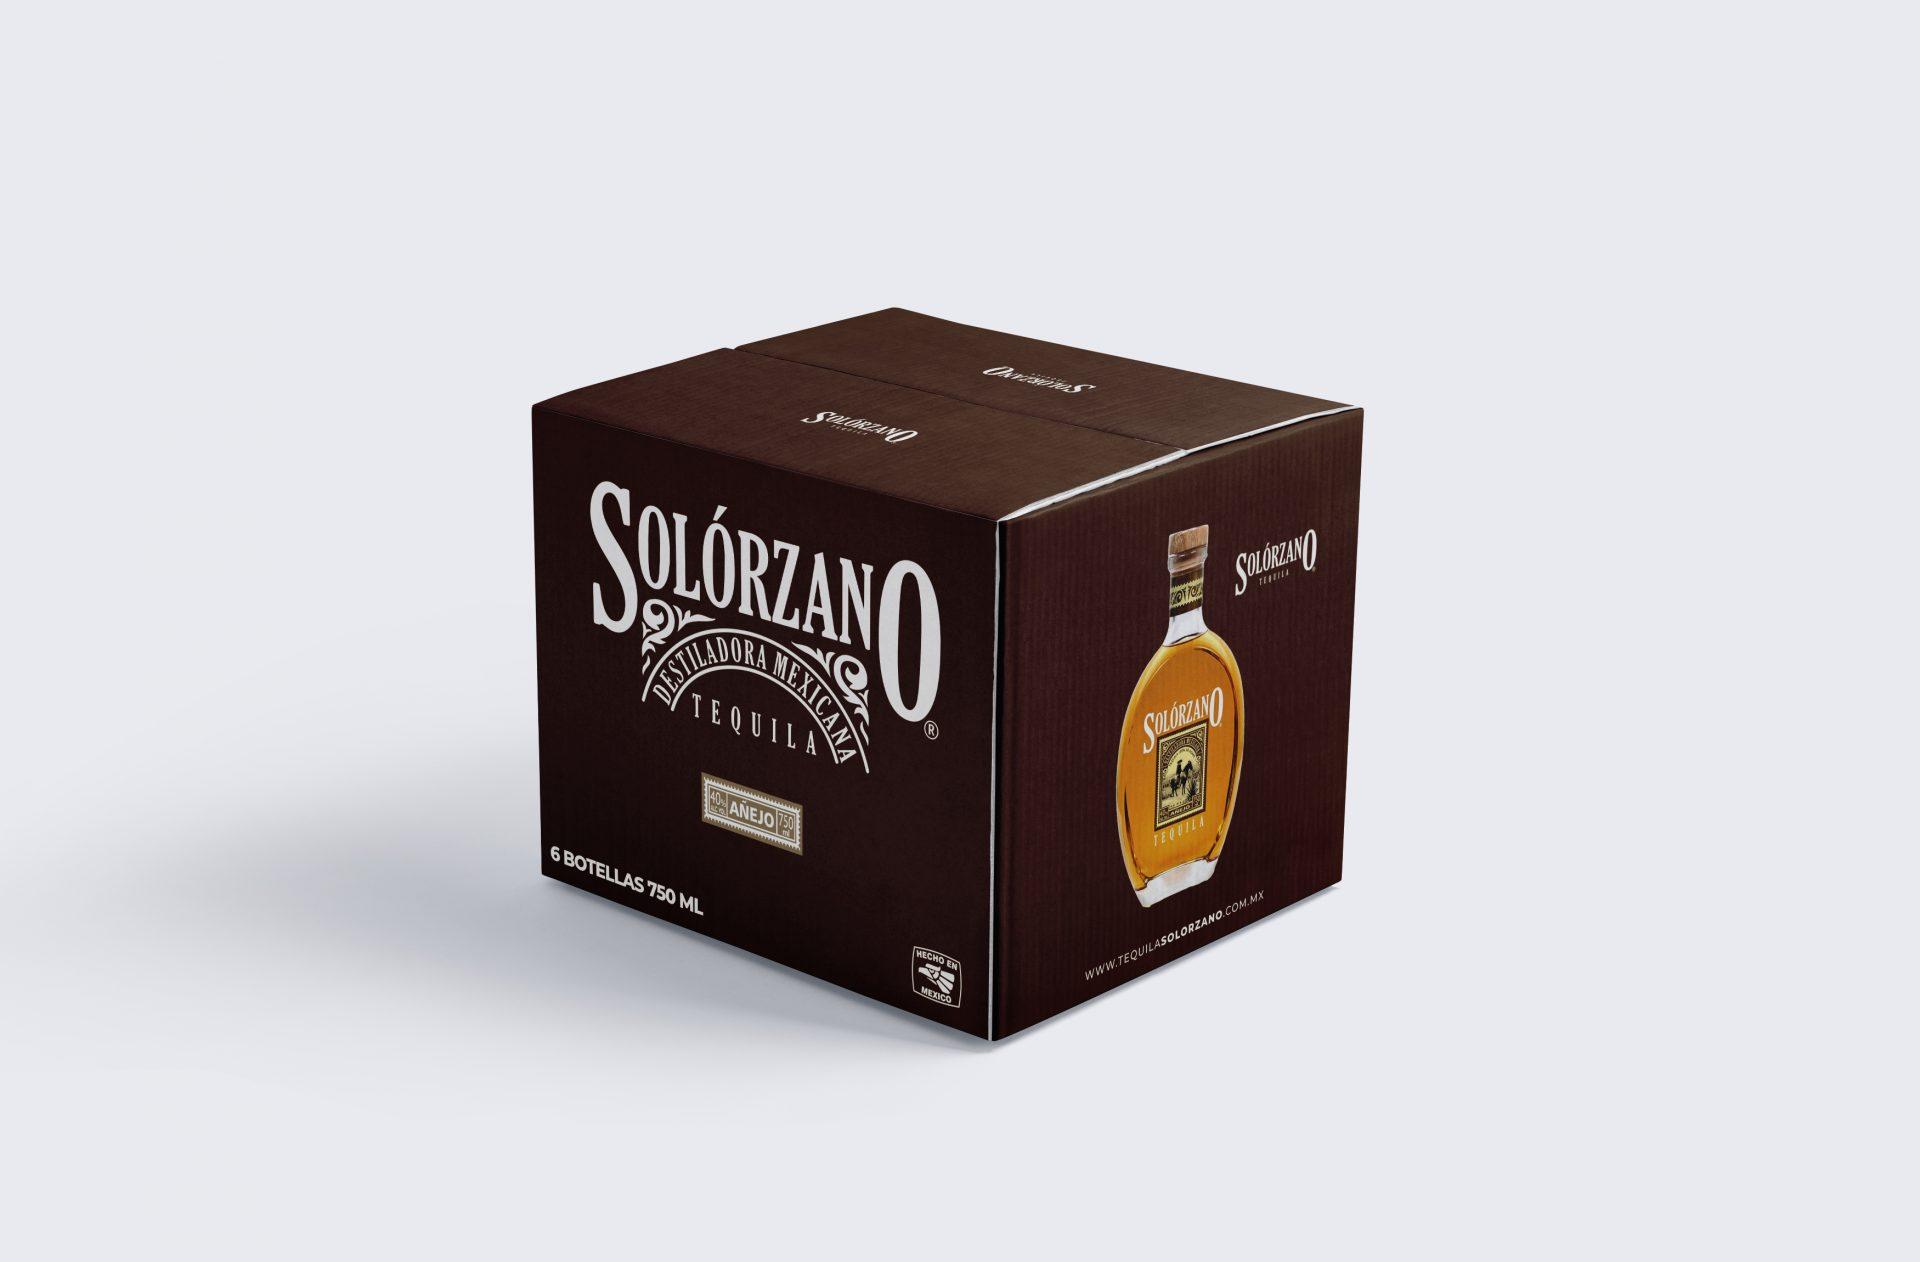 Caja Solorzano Añejo 750ml